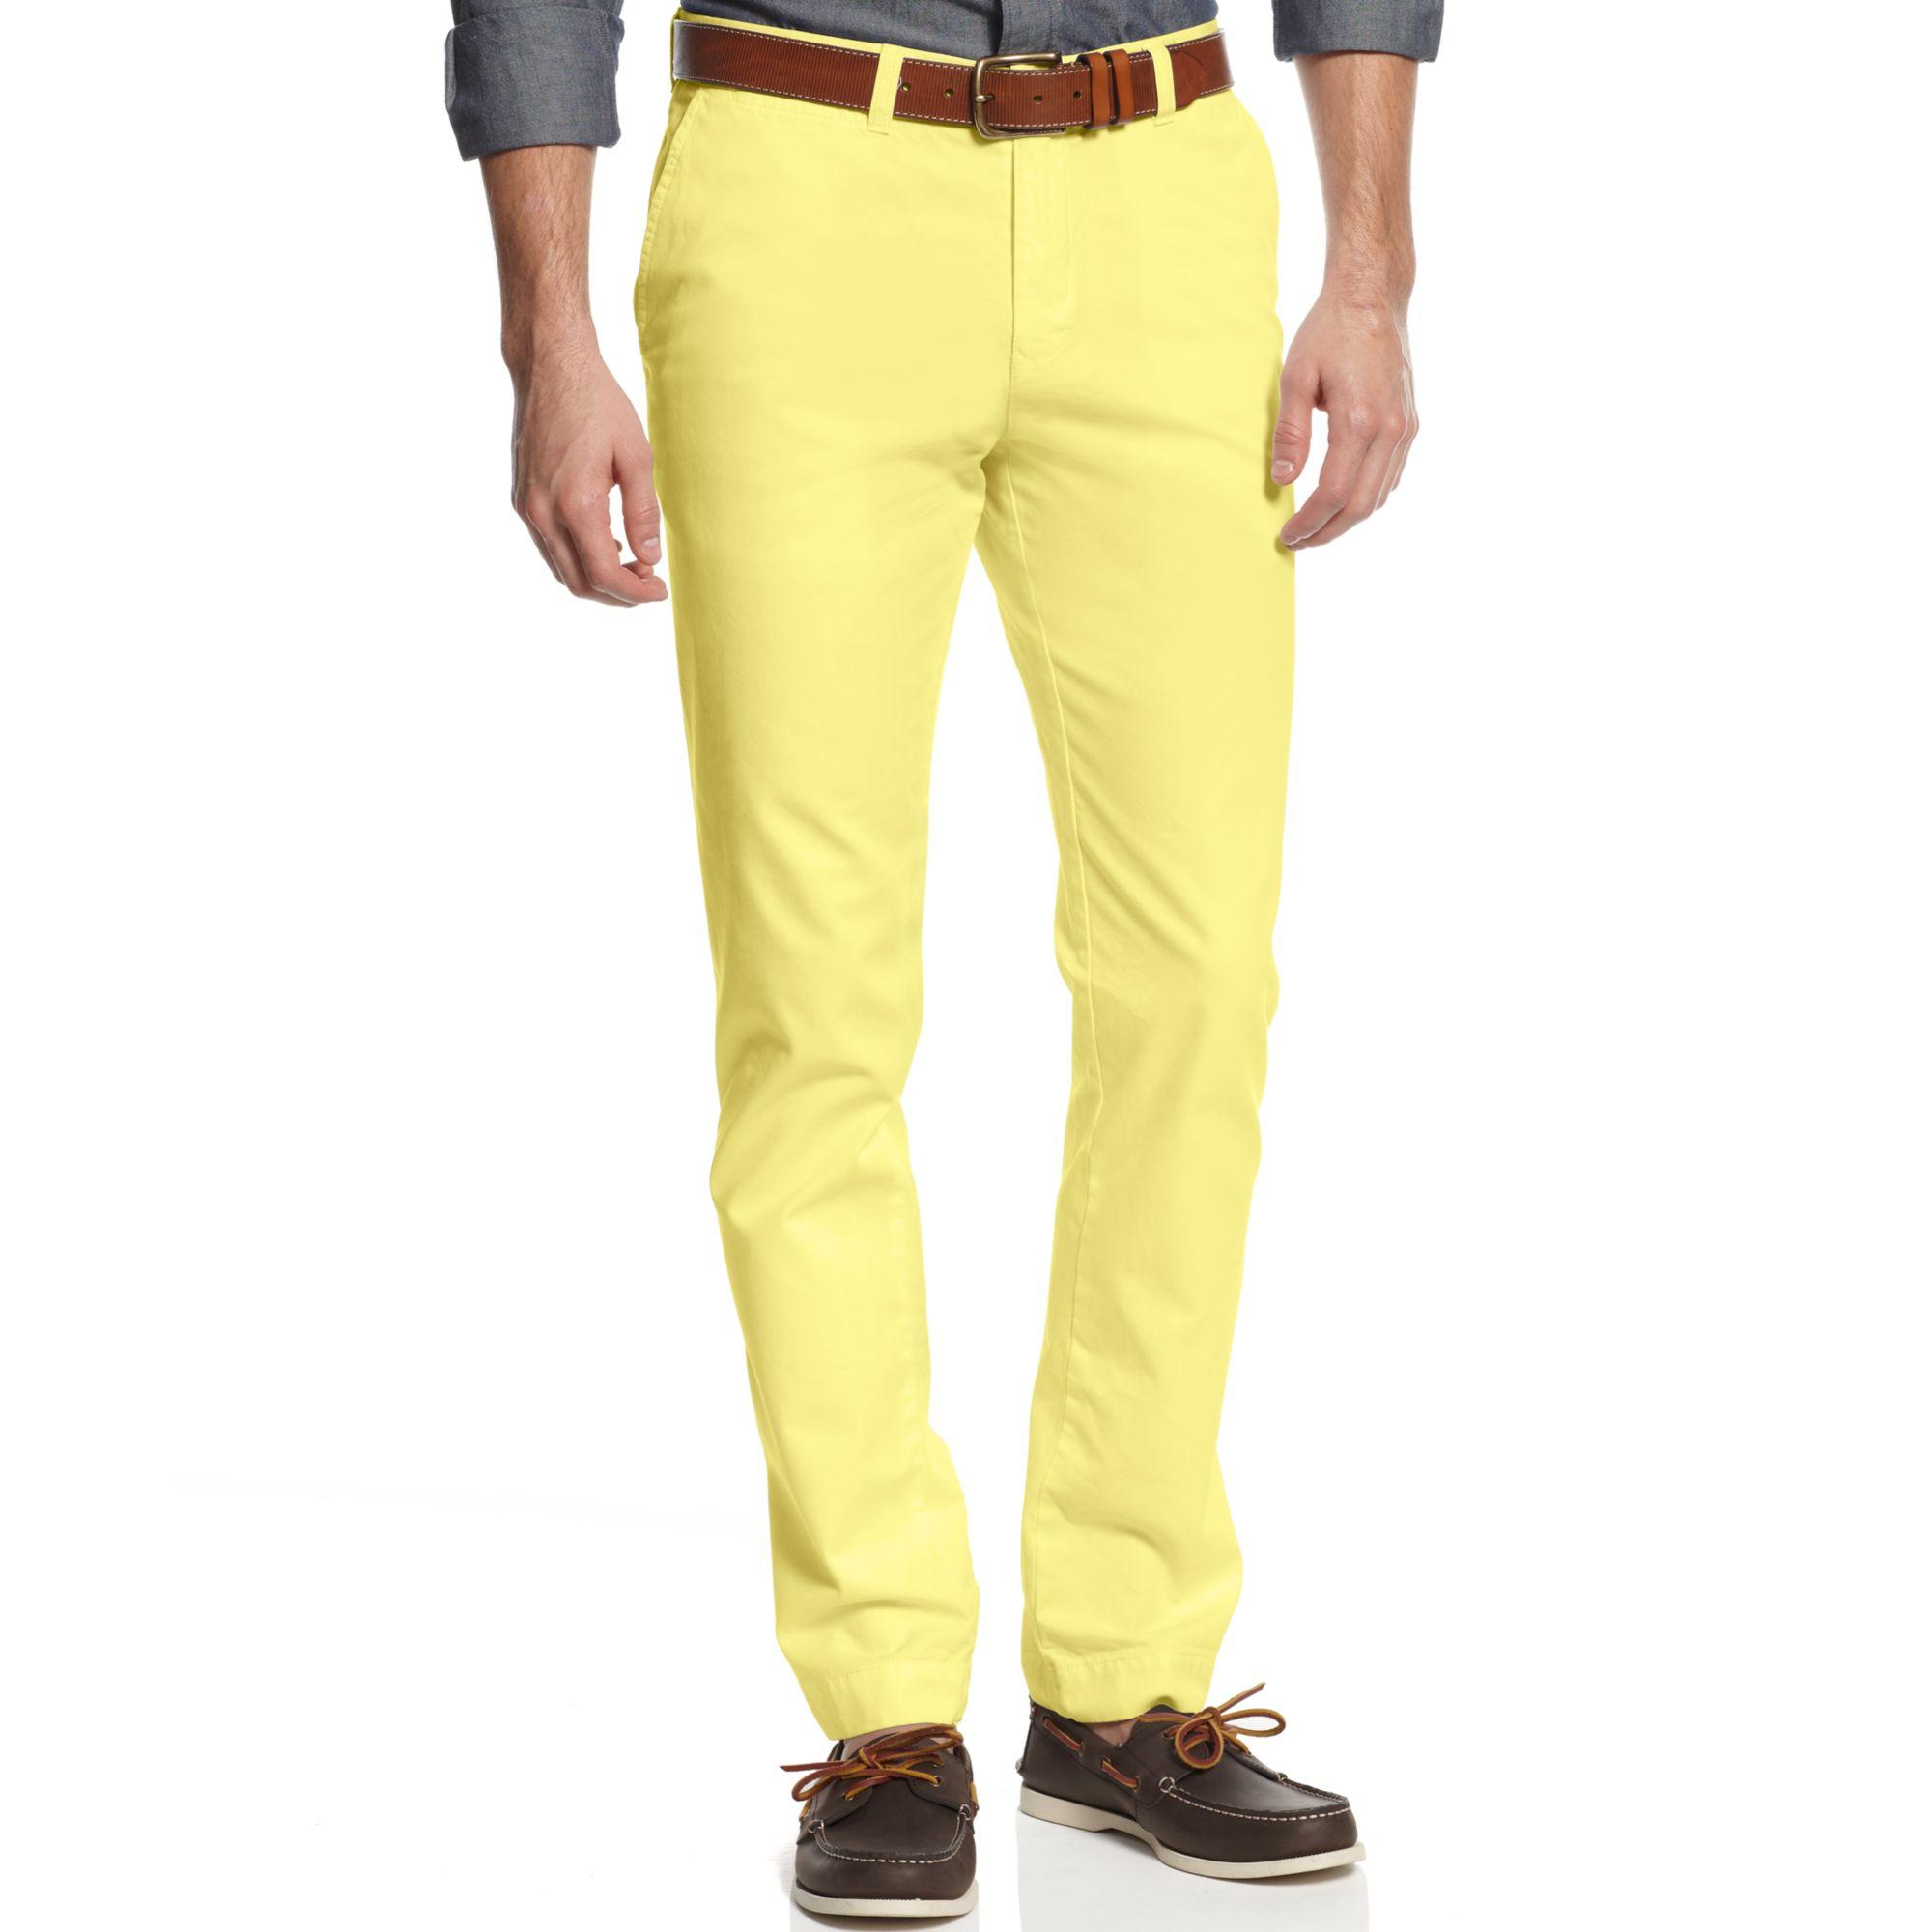 Slim Fit Graduate Chino Pants